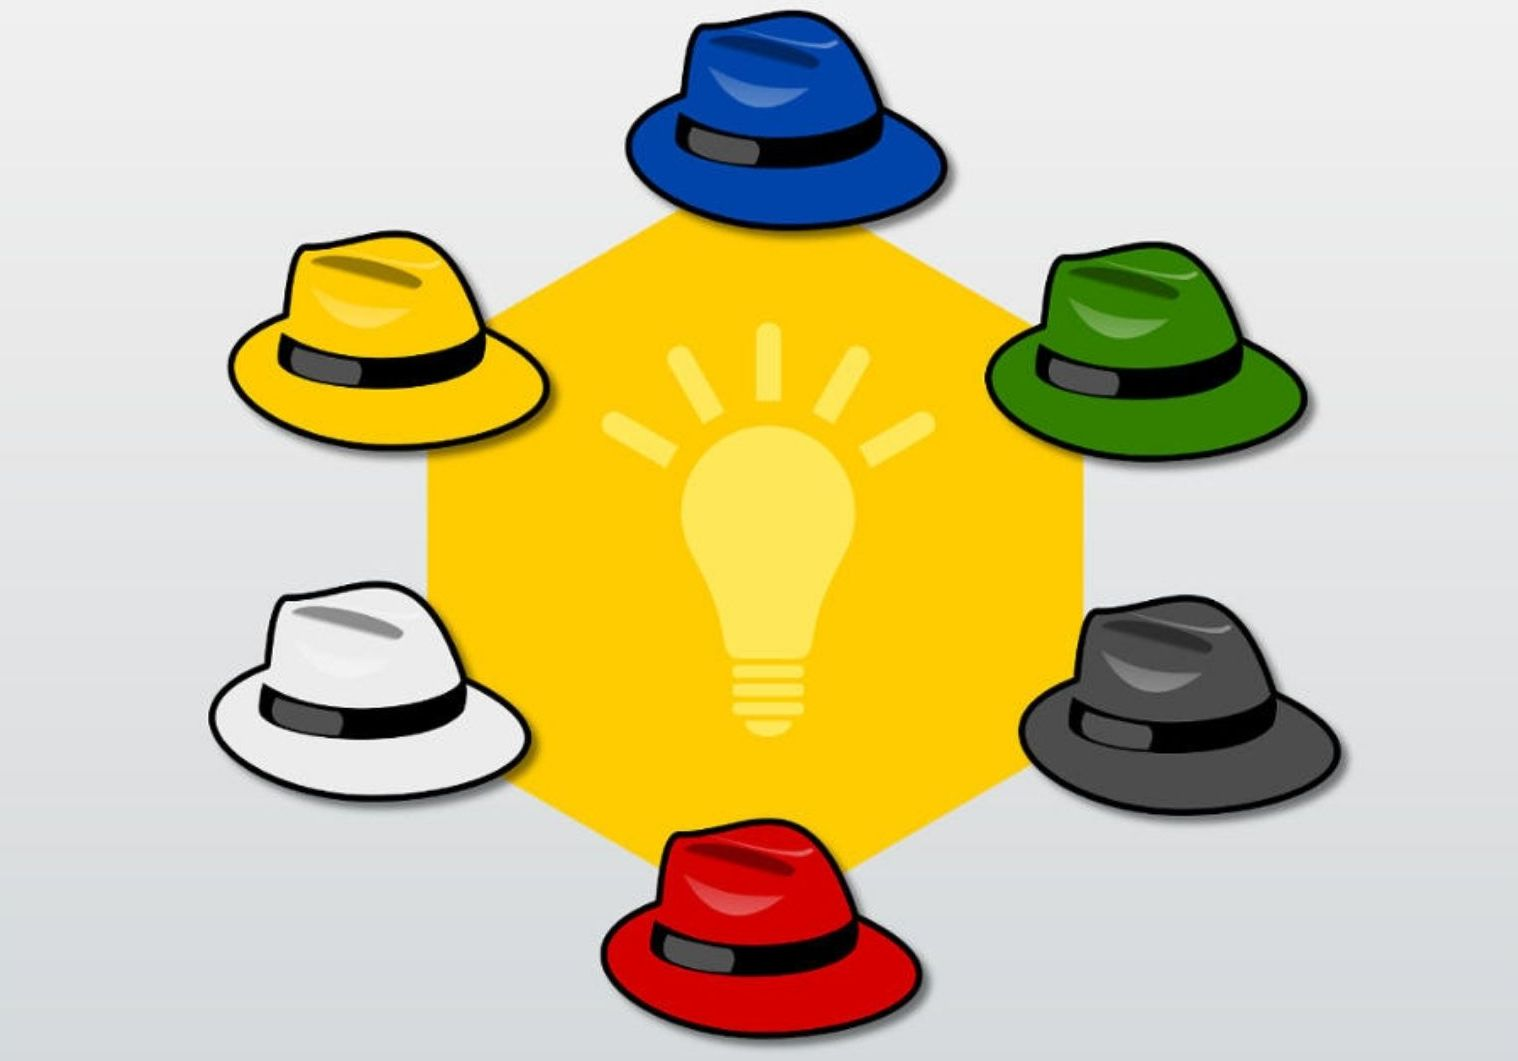 The framework of Six Thinking Hats